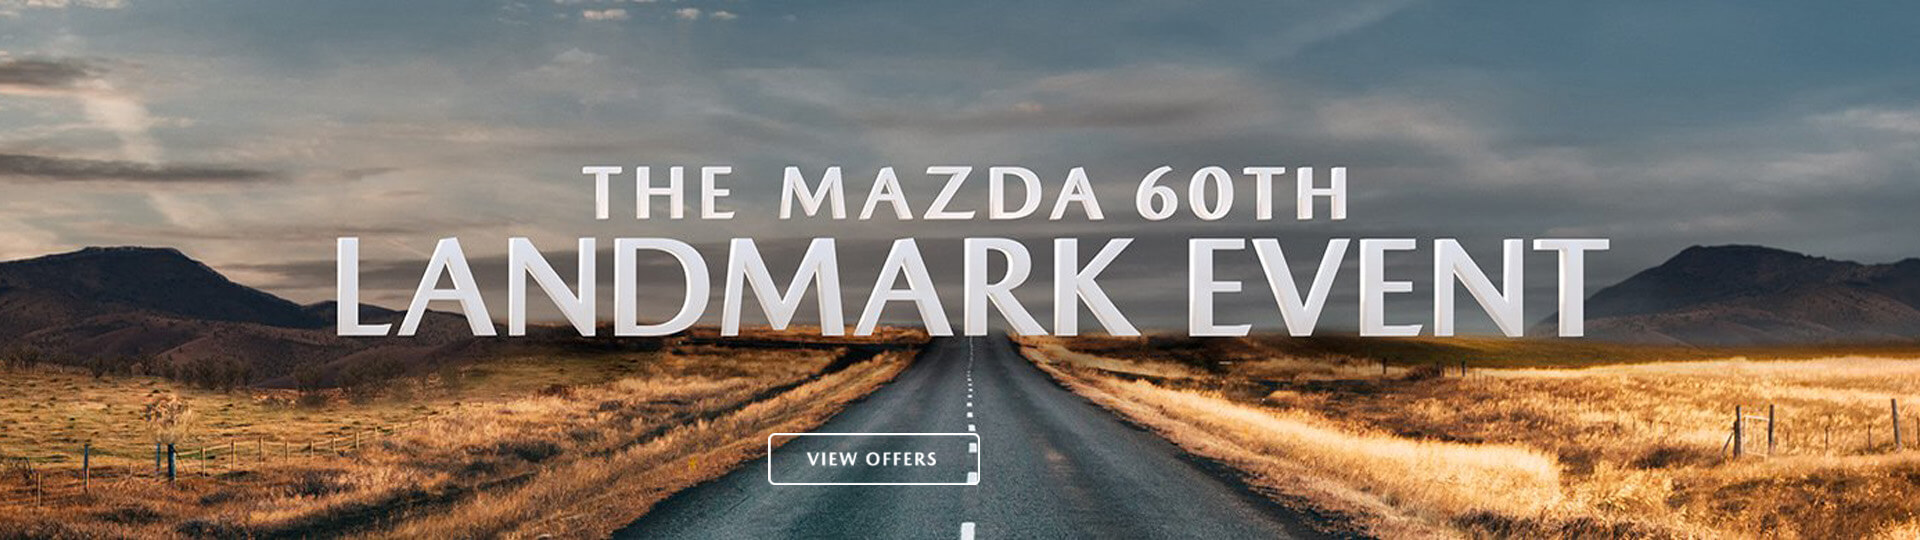 The Mazda 60th Landmark Event